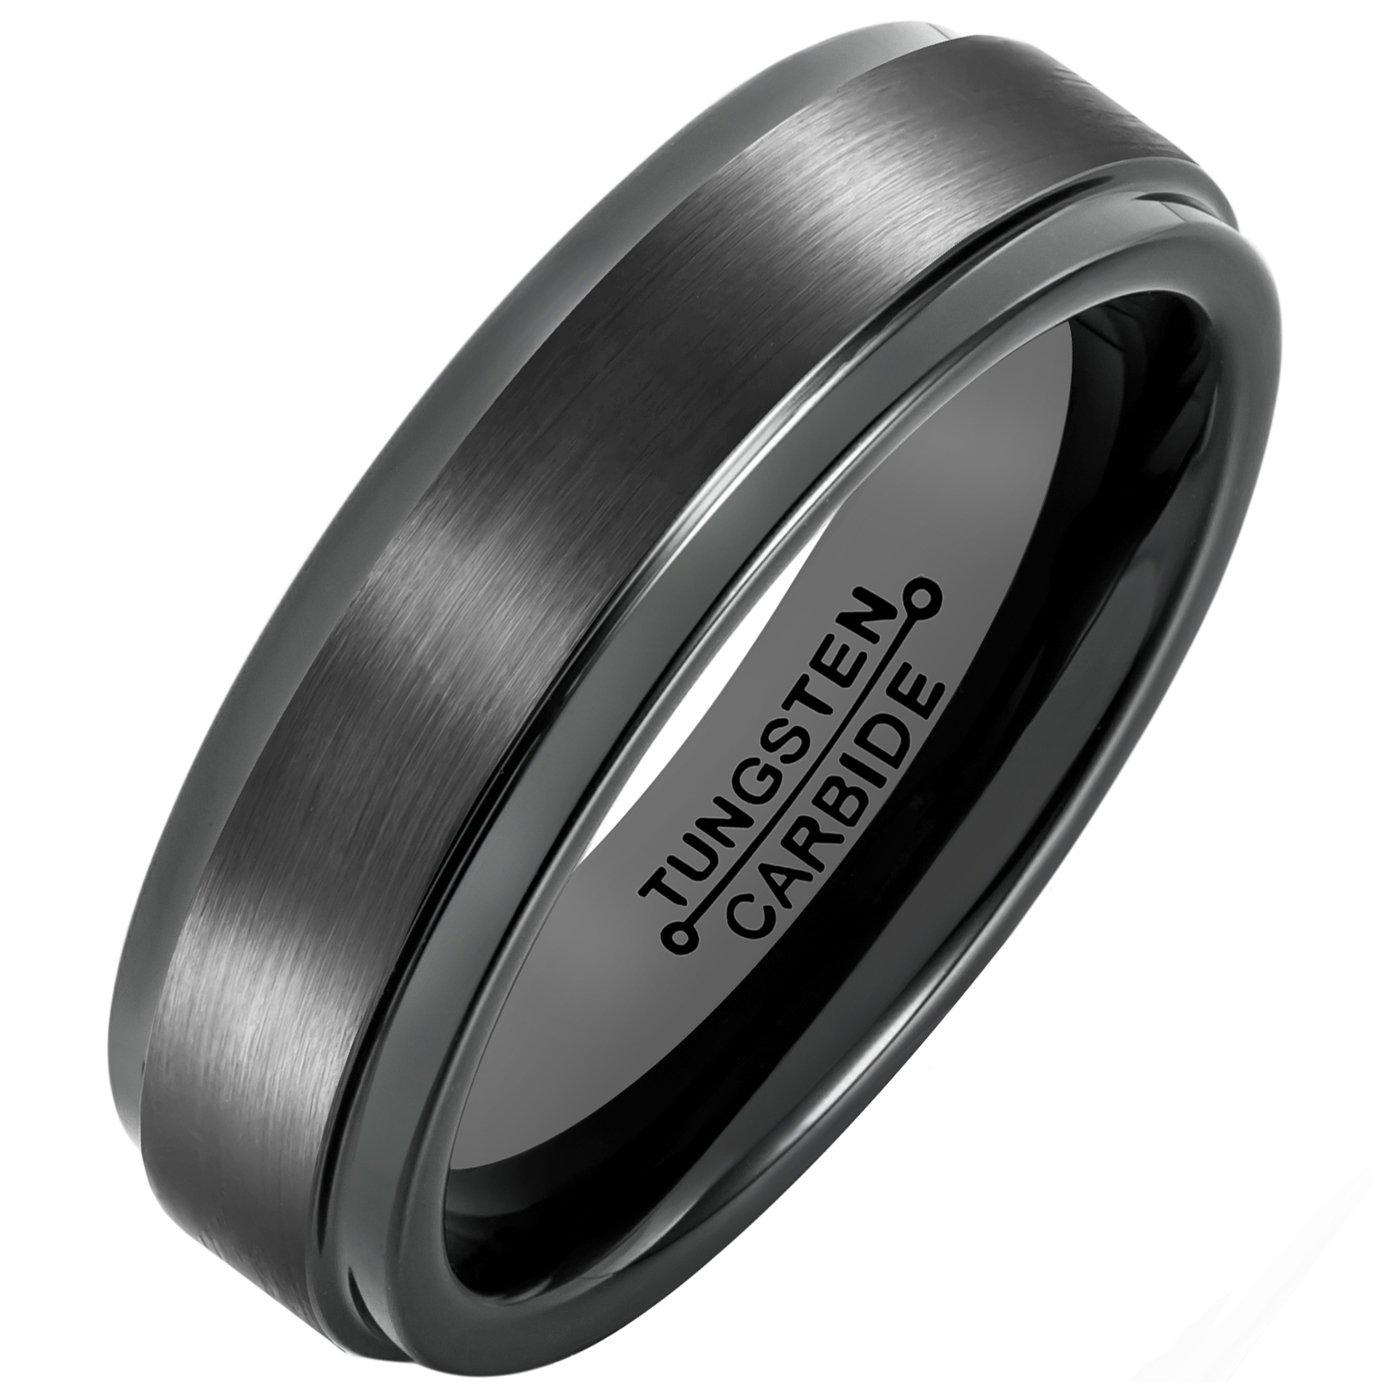 MNH Tungsten Carbide Black Men's  Wedding Band Brushed Matte Finish Polished Edge Engagement Ring, 11